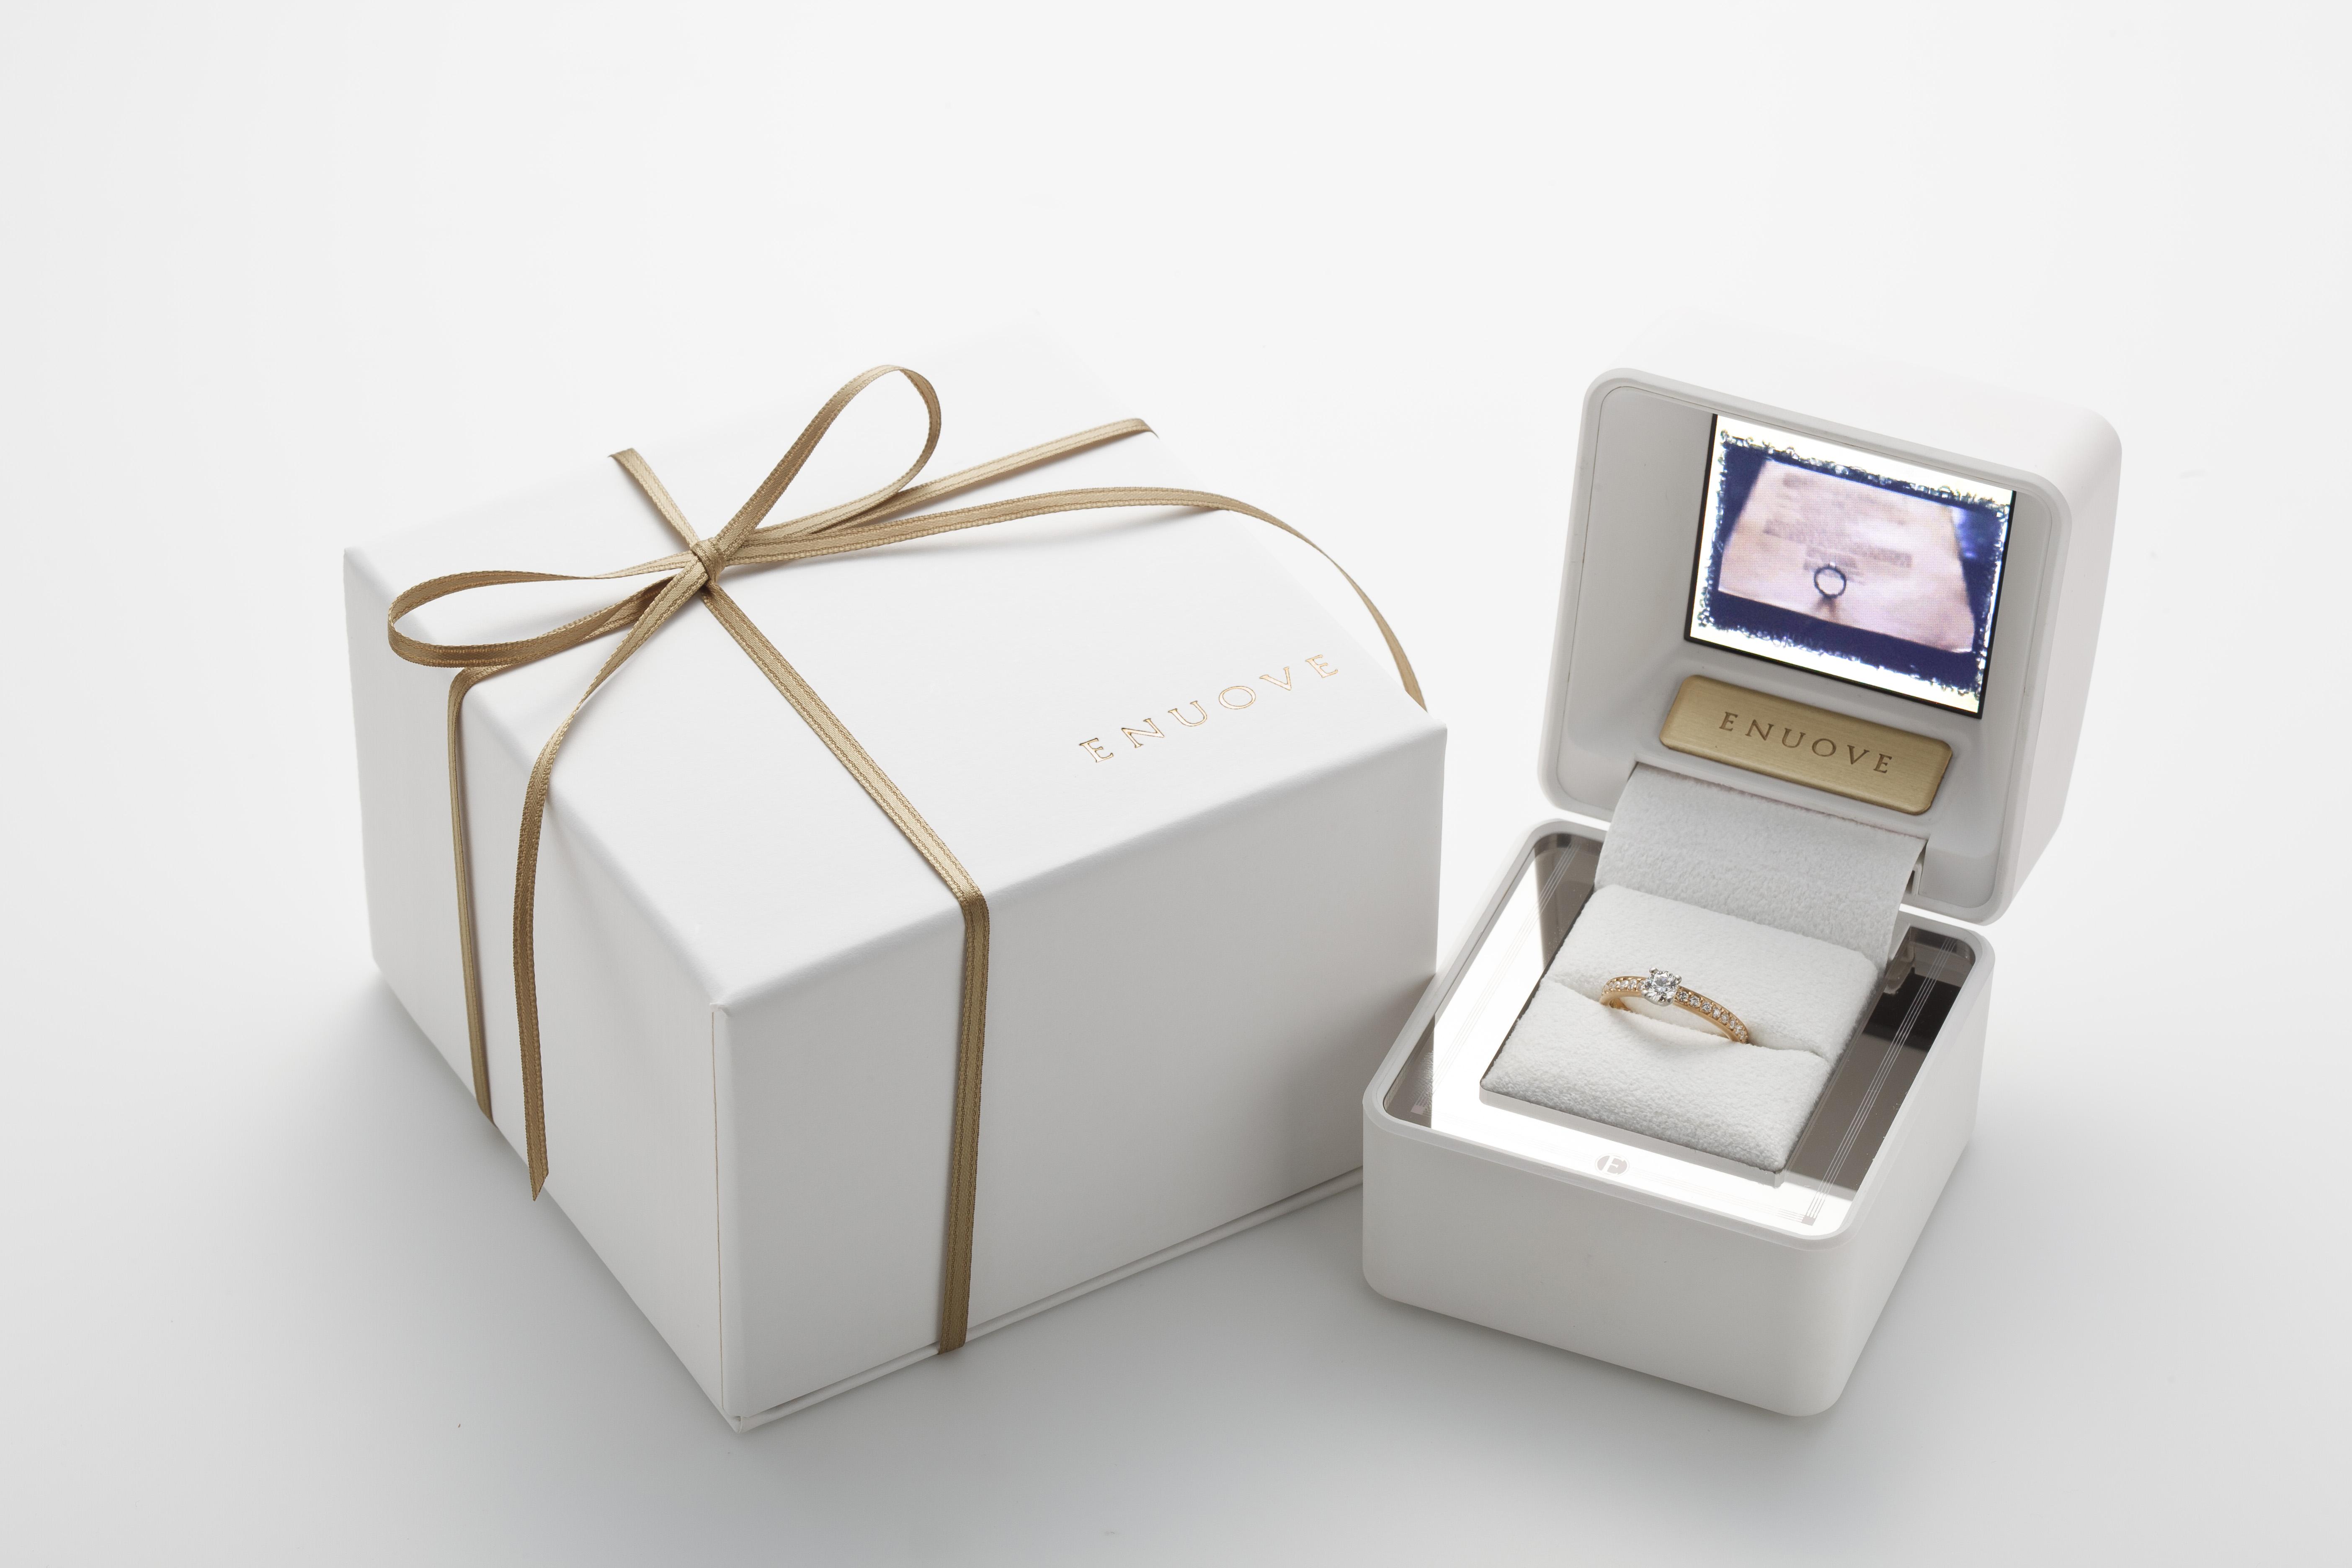 http://www.eikodo-bridal.jp/cms/wp-content/uploads/2013/03/movie-box.jpg